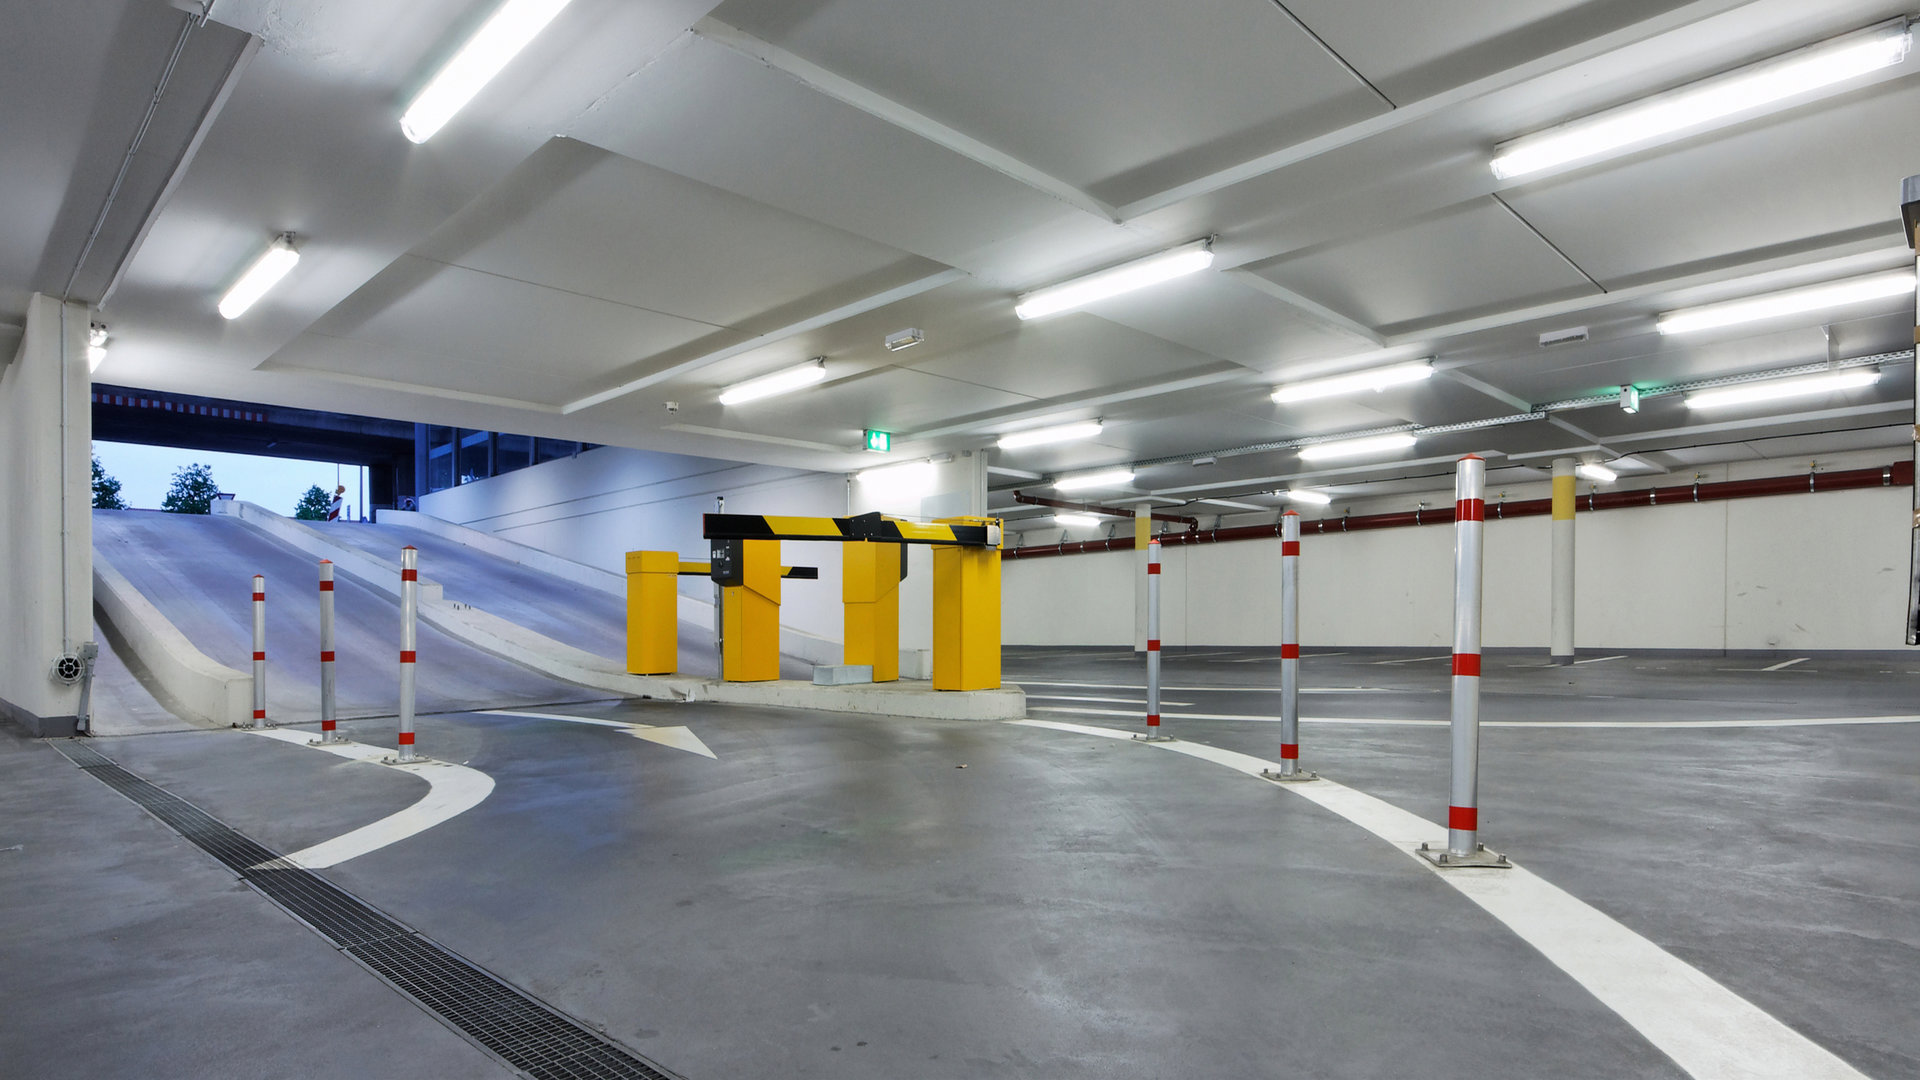 Anwendung Parkhaus Feuchtraumleuchte VASCA PRO